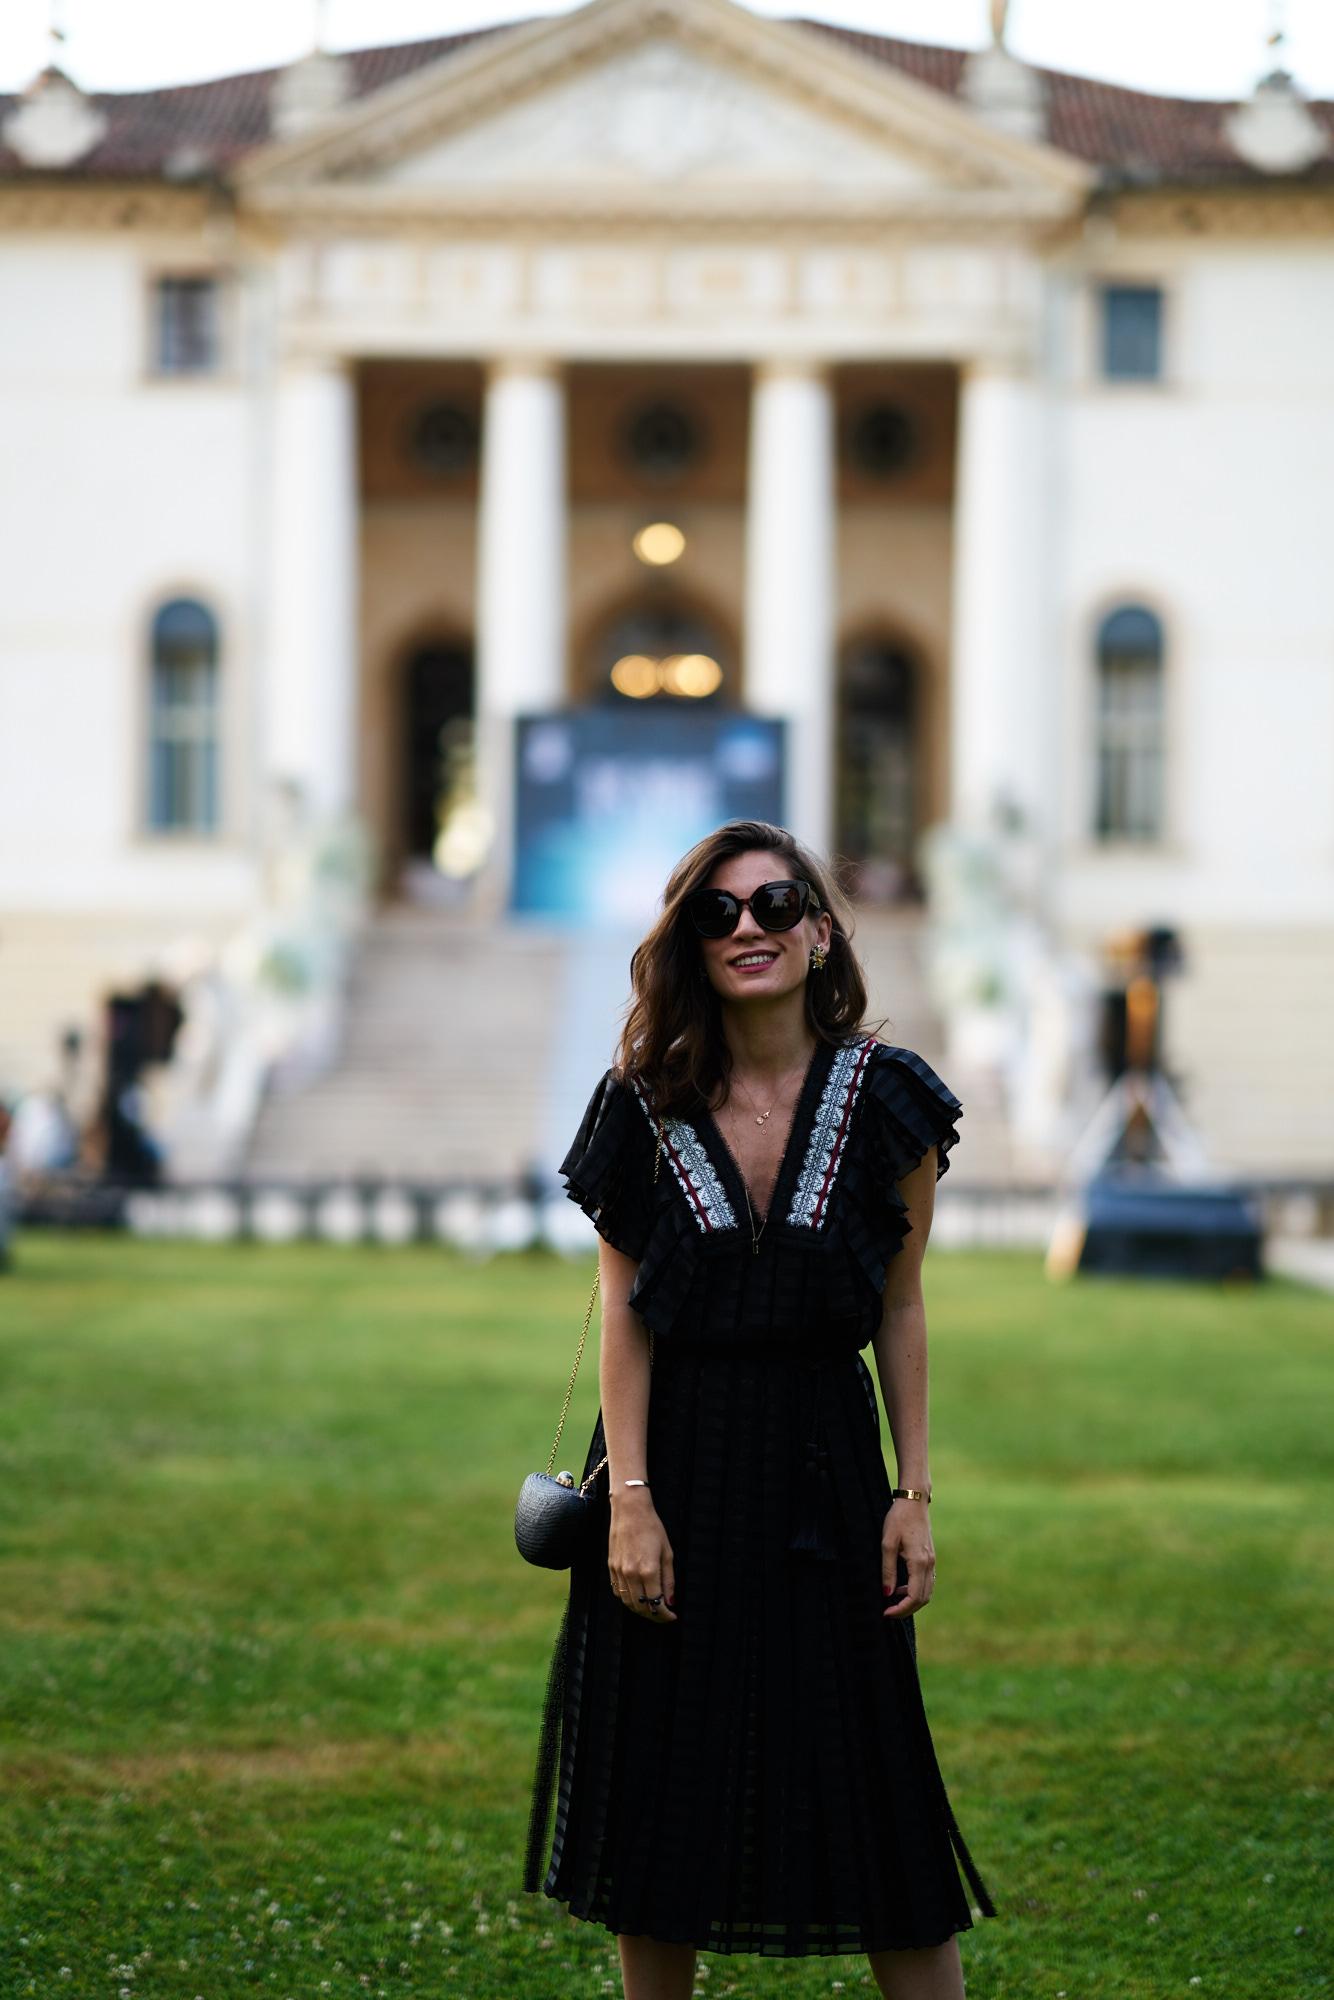 billur saatci, offnegiysem, street style, turkish style blogger, lug von siga, gül ağış, balenciaga, intropia, marni